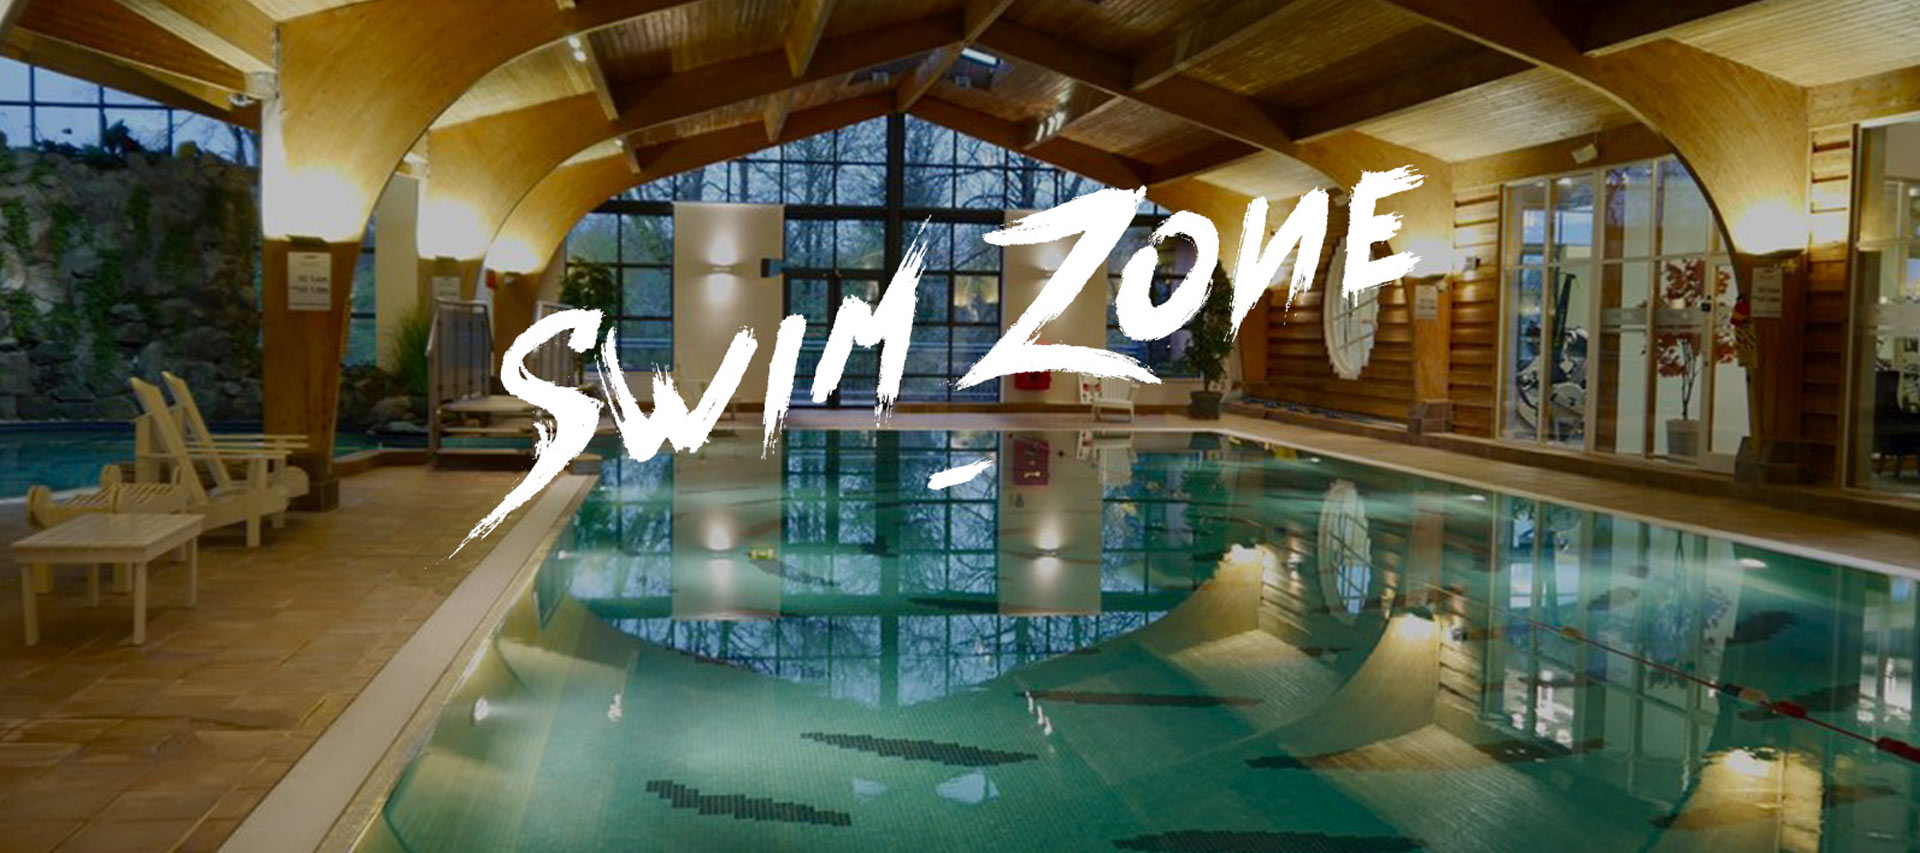 kilkenny swimming pool active club